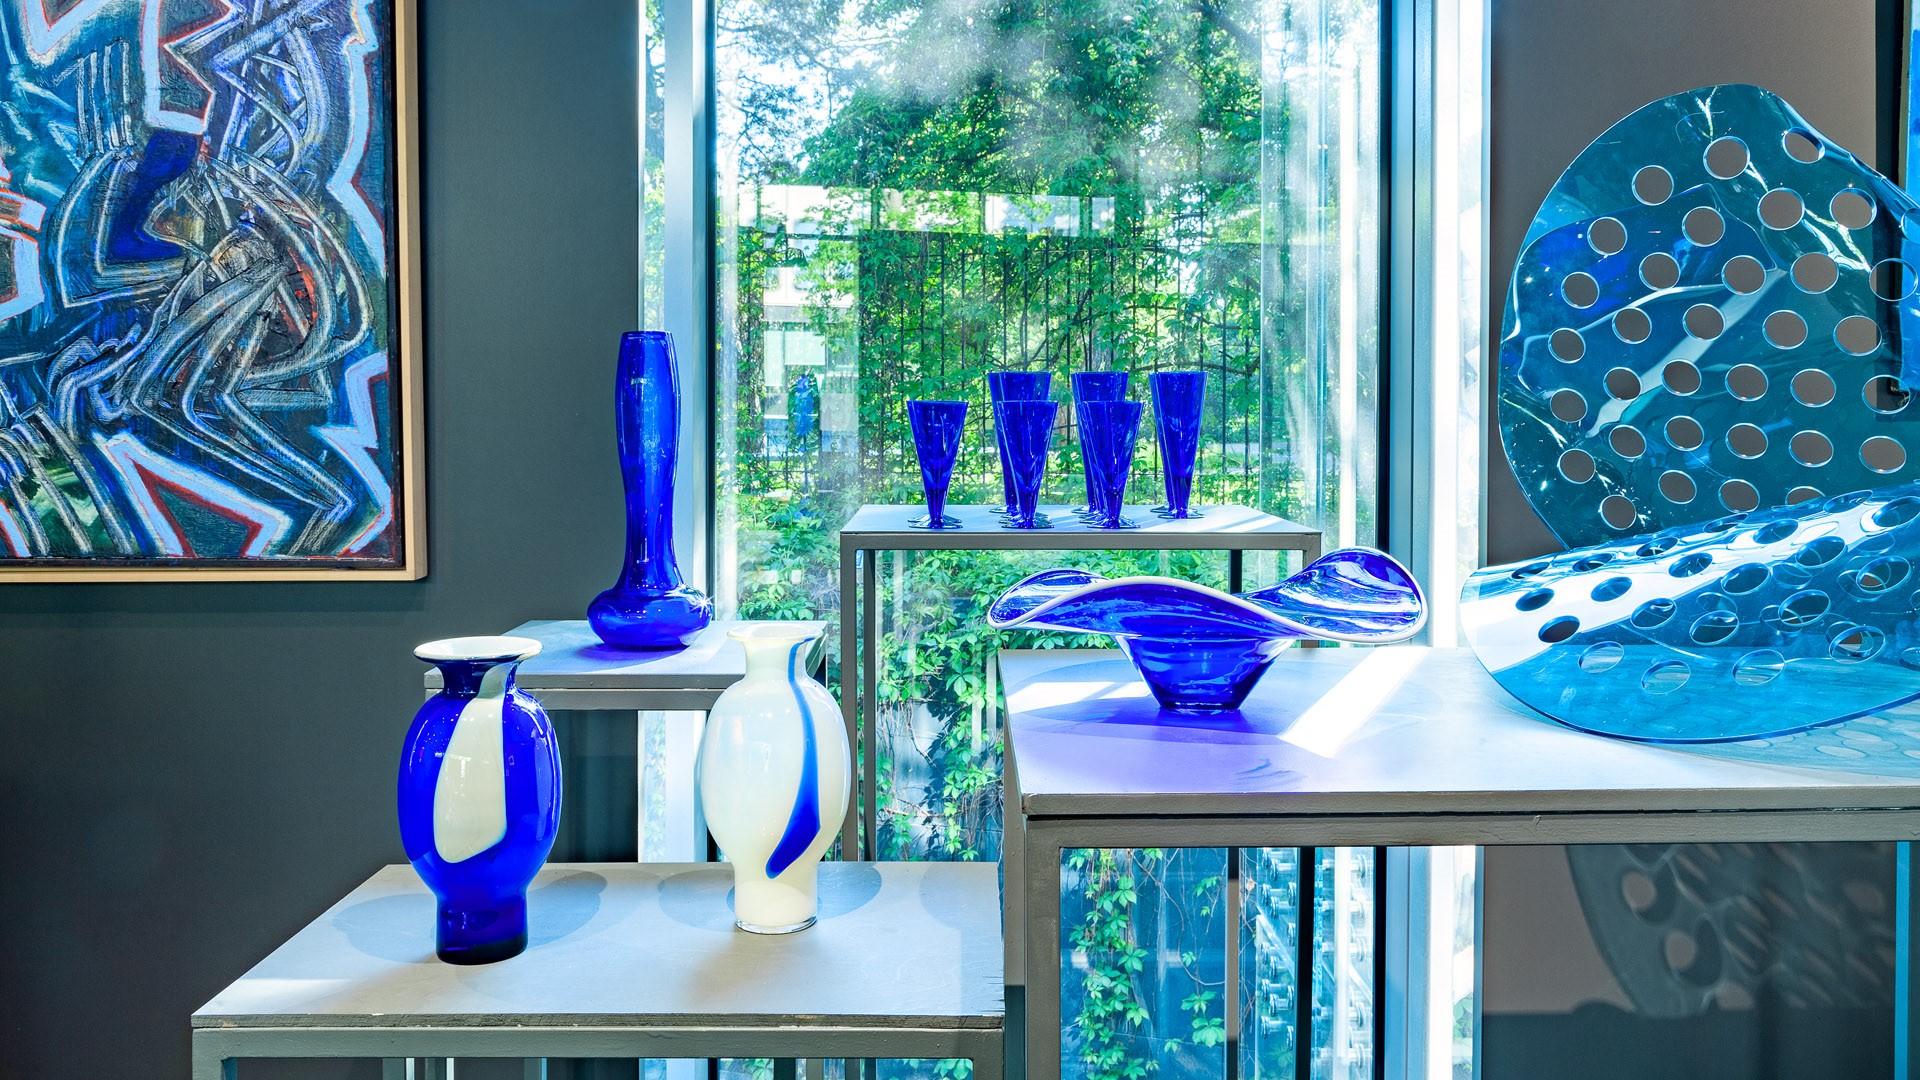 Arrangement photo of objects from Classic Blue, DESA Unicum auction